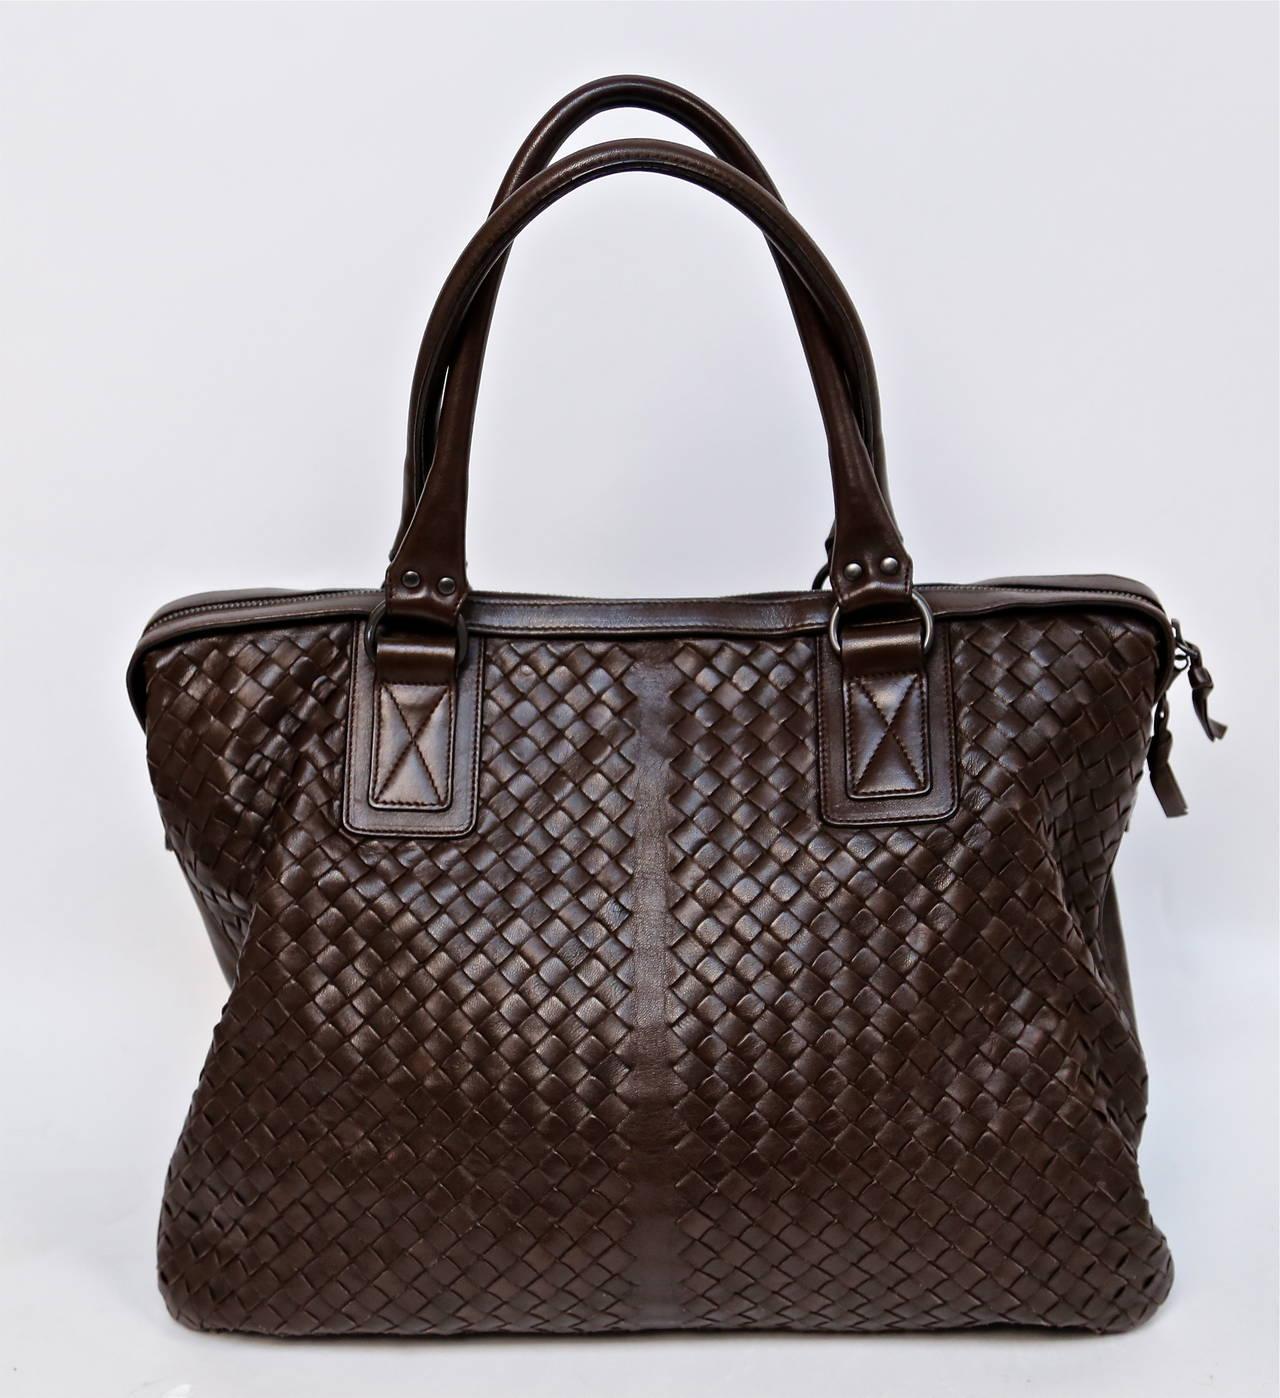 BOTTEGA VENETA oversized brown intrecciato woven leather tote bag 2